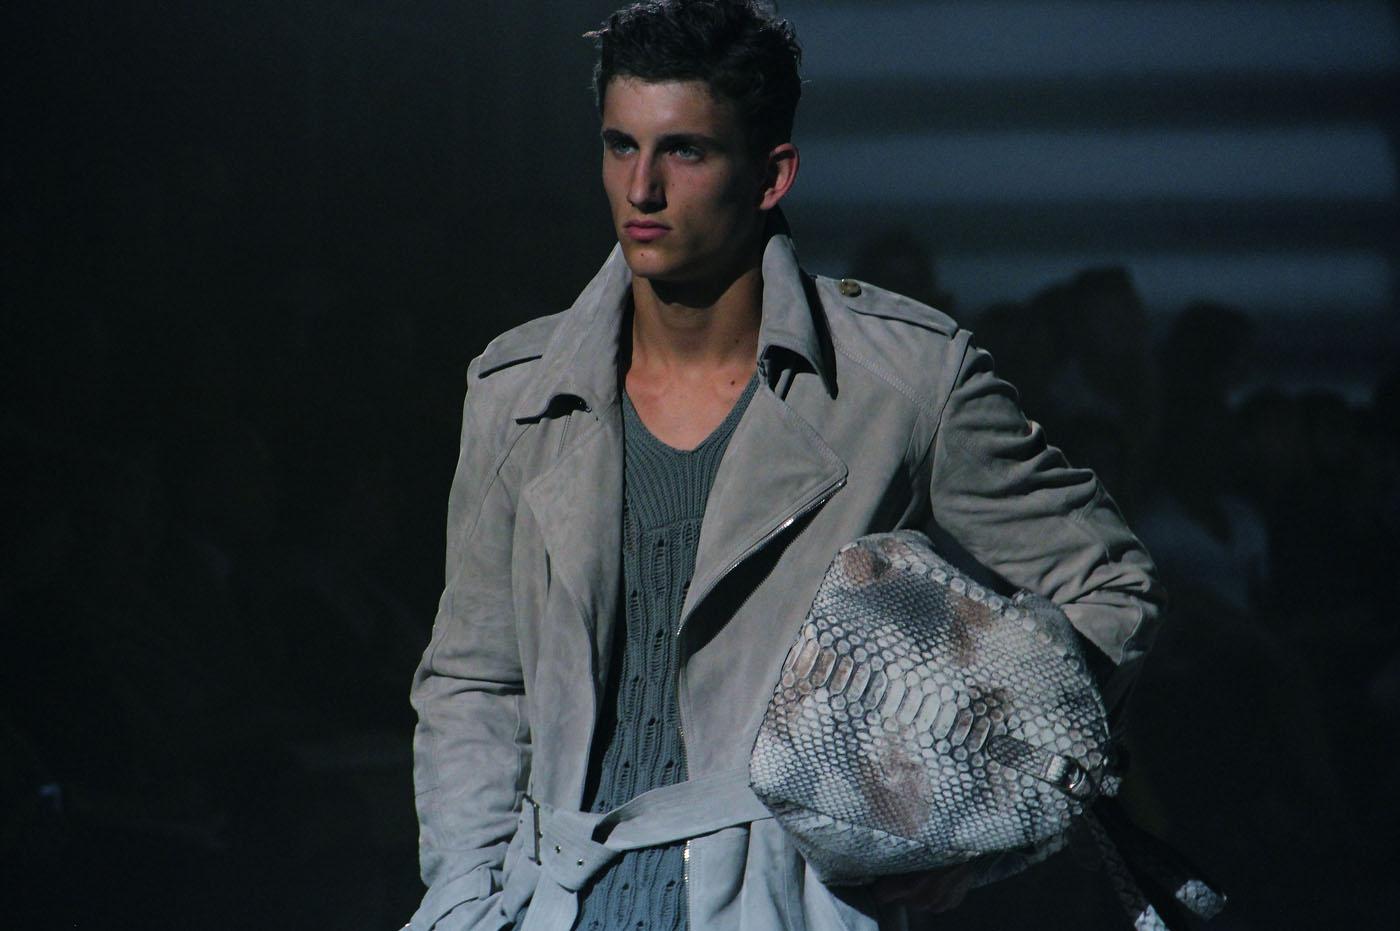 corneliani-spring-summer-2012-men-collection-milano-fashion-week-2012-corneliani-primavera-estate-catwalk-2012